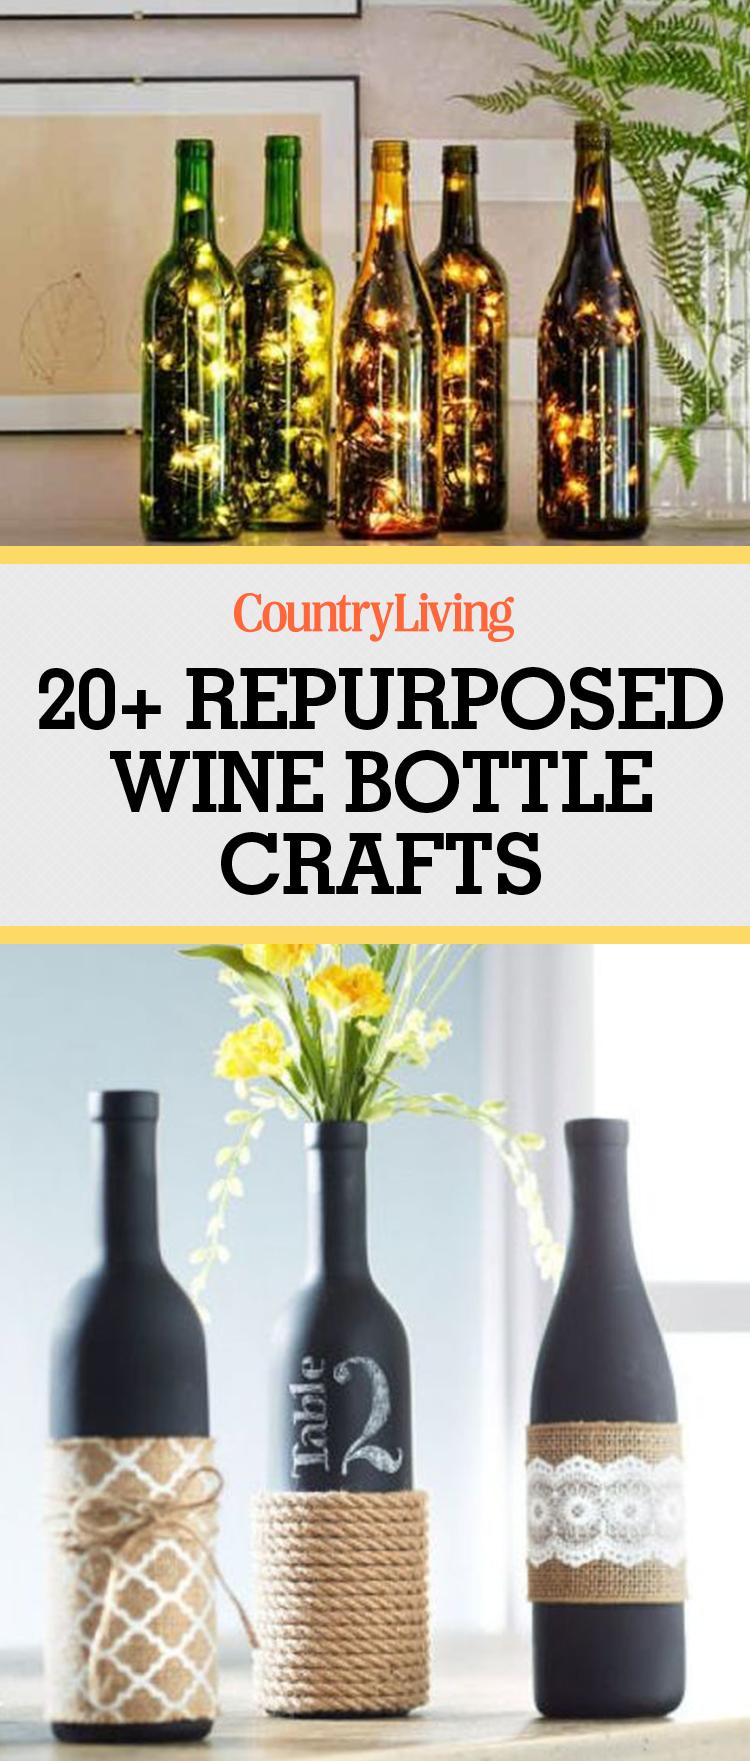 24 diy wine bottle crafts empty wine bottle decoration ideas for Diy wine bottle crafts pinterest